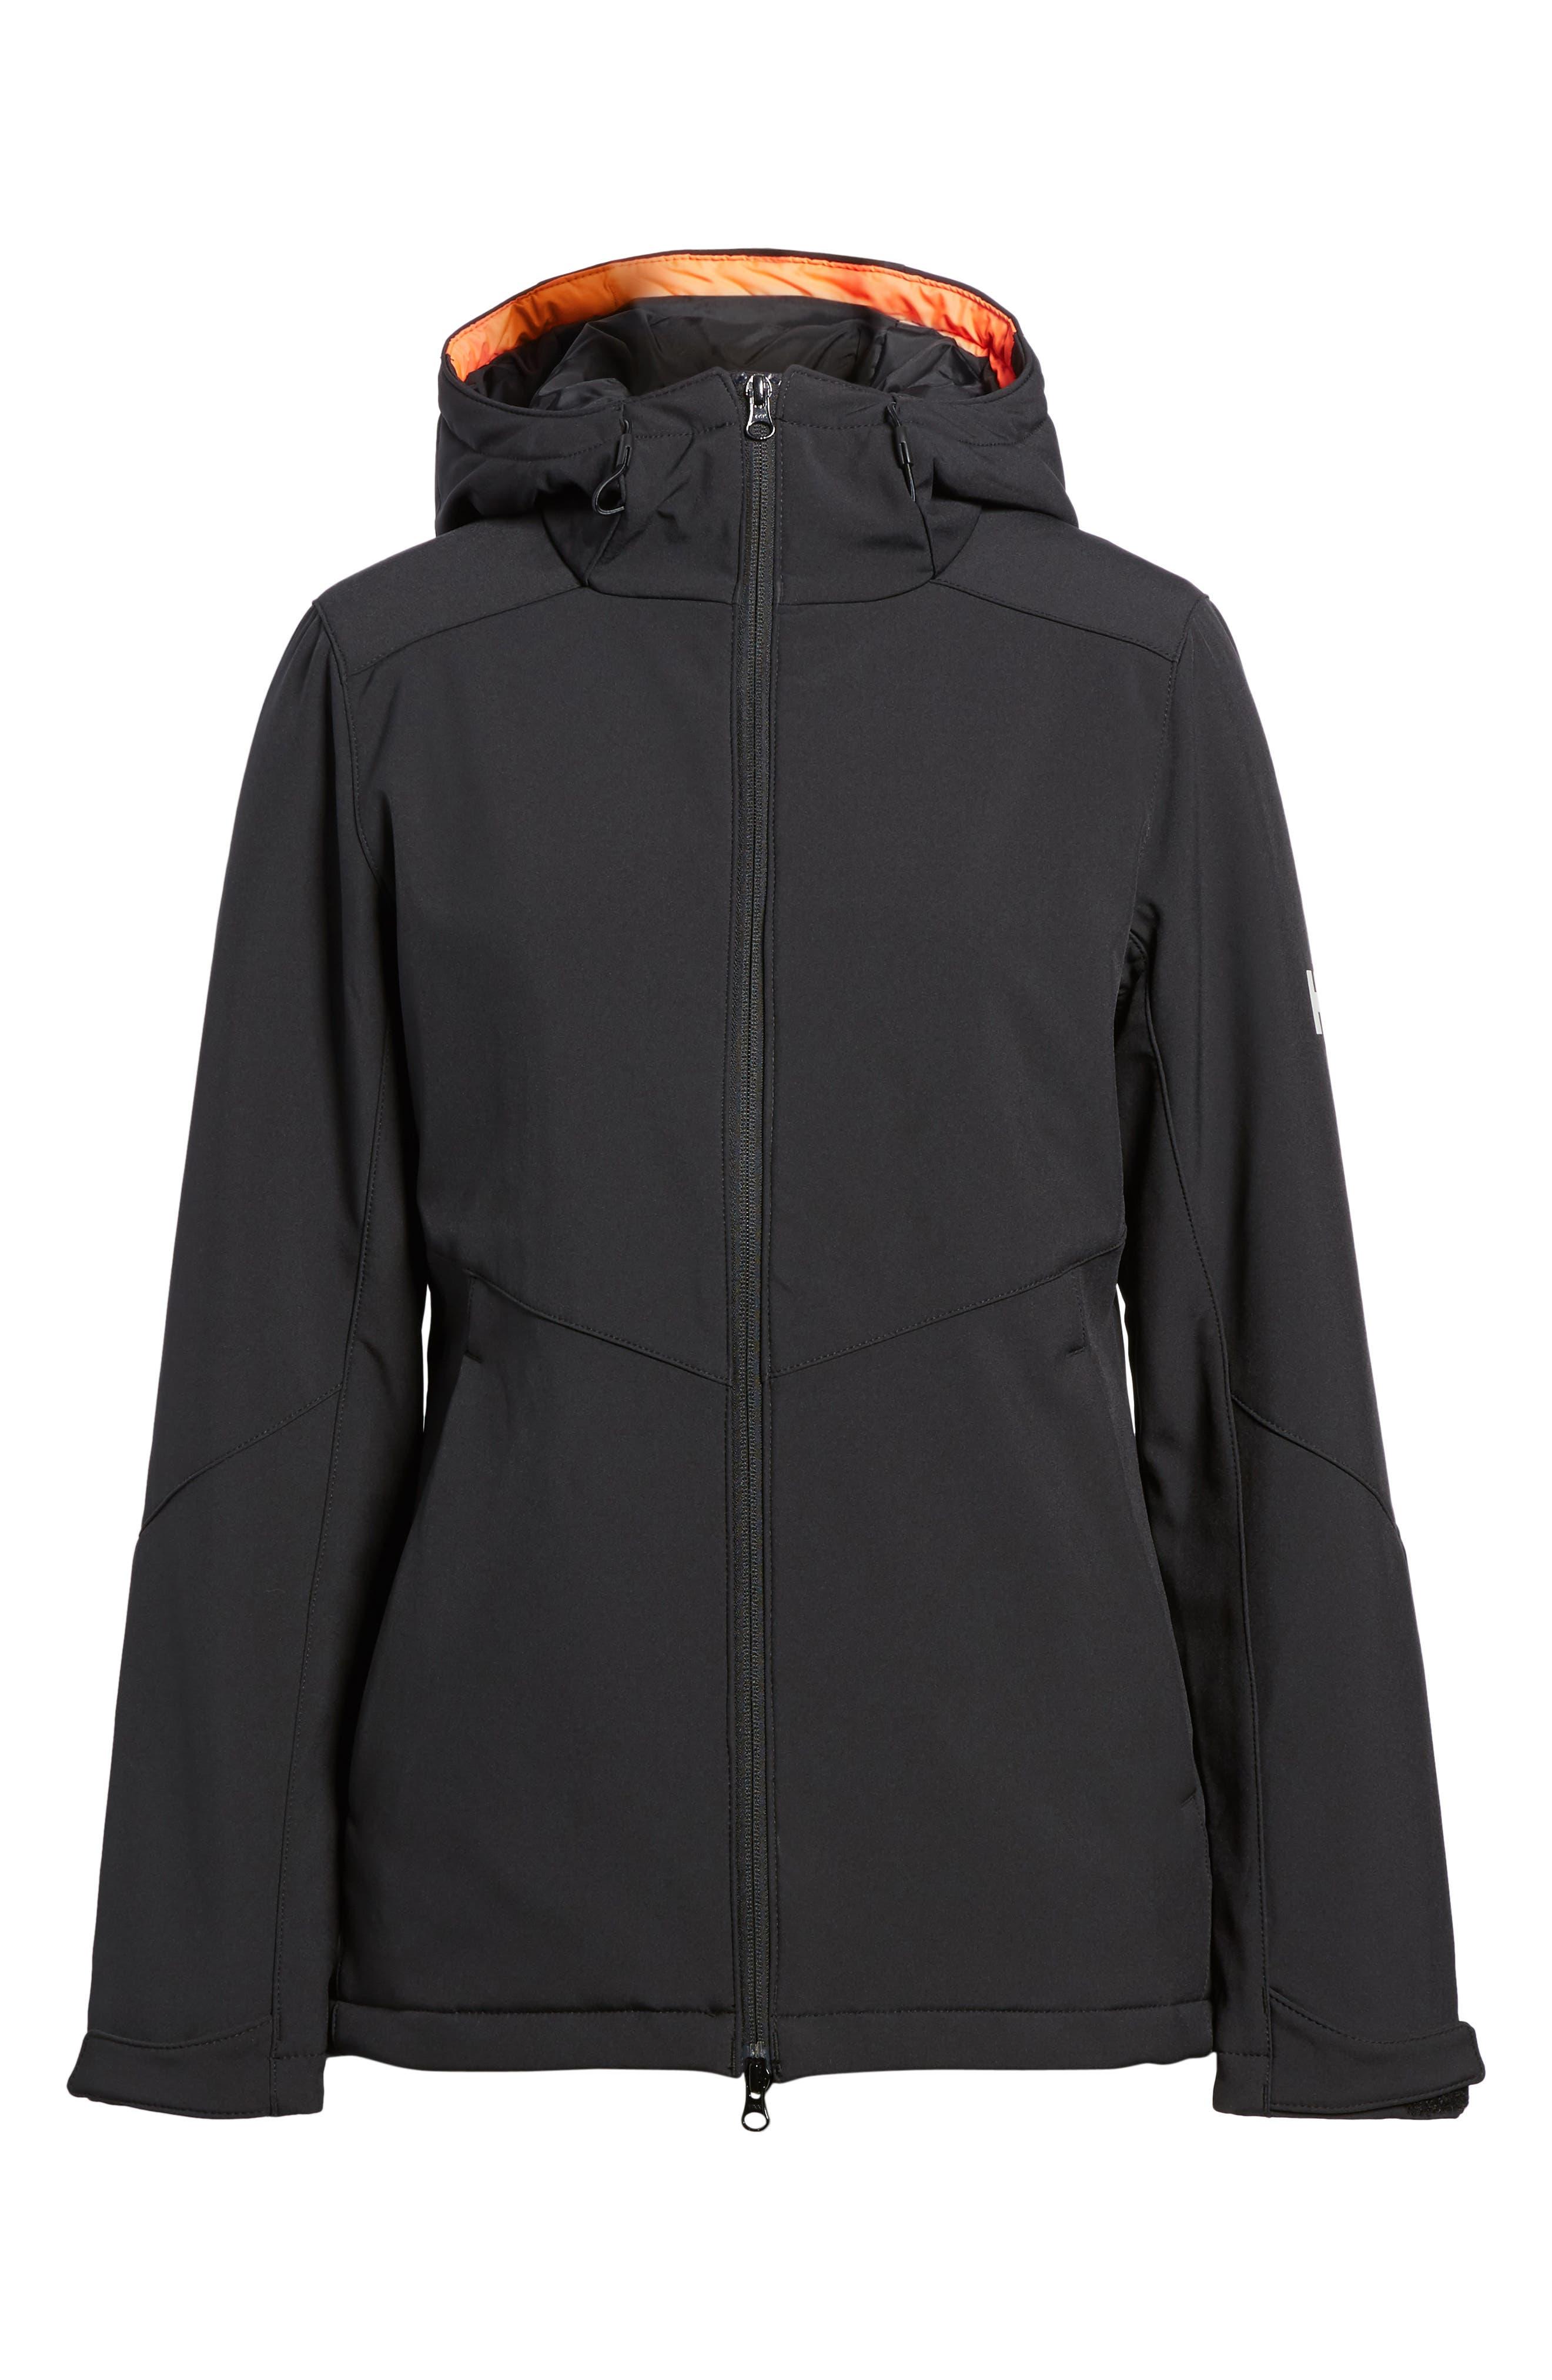 Lofn Hooded Insulated Soft Shell Jacket,                             Alternate thumbnail 6, color,                             Black